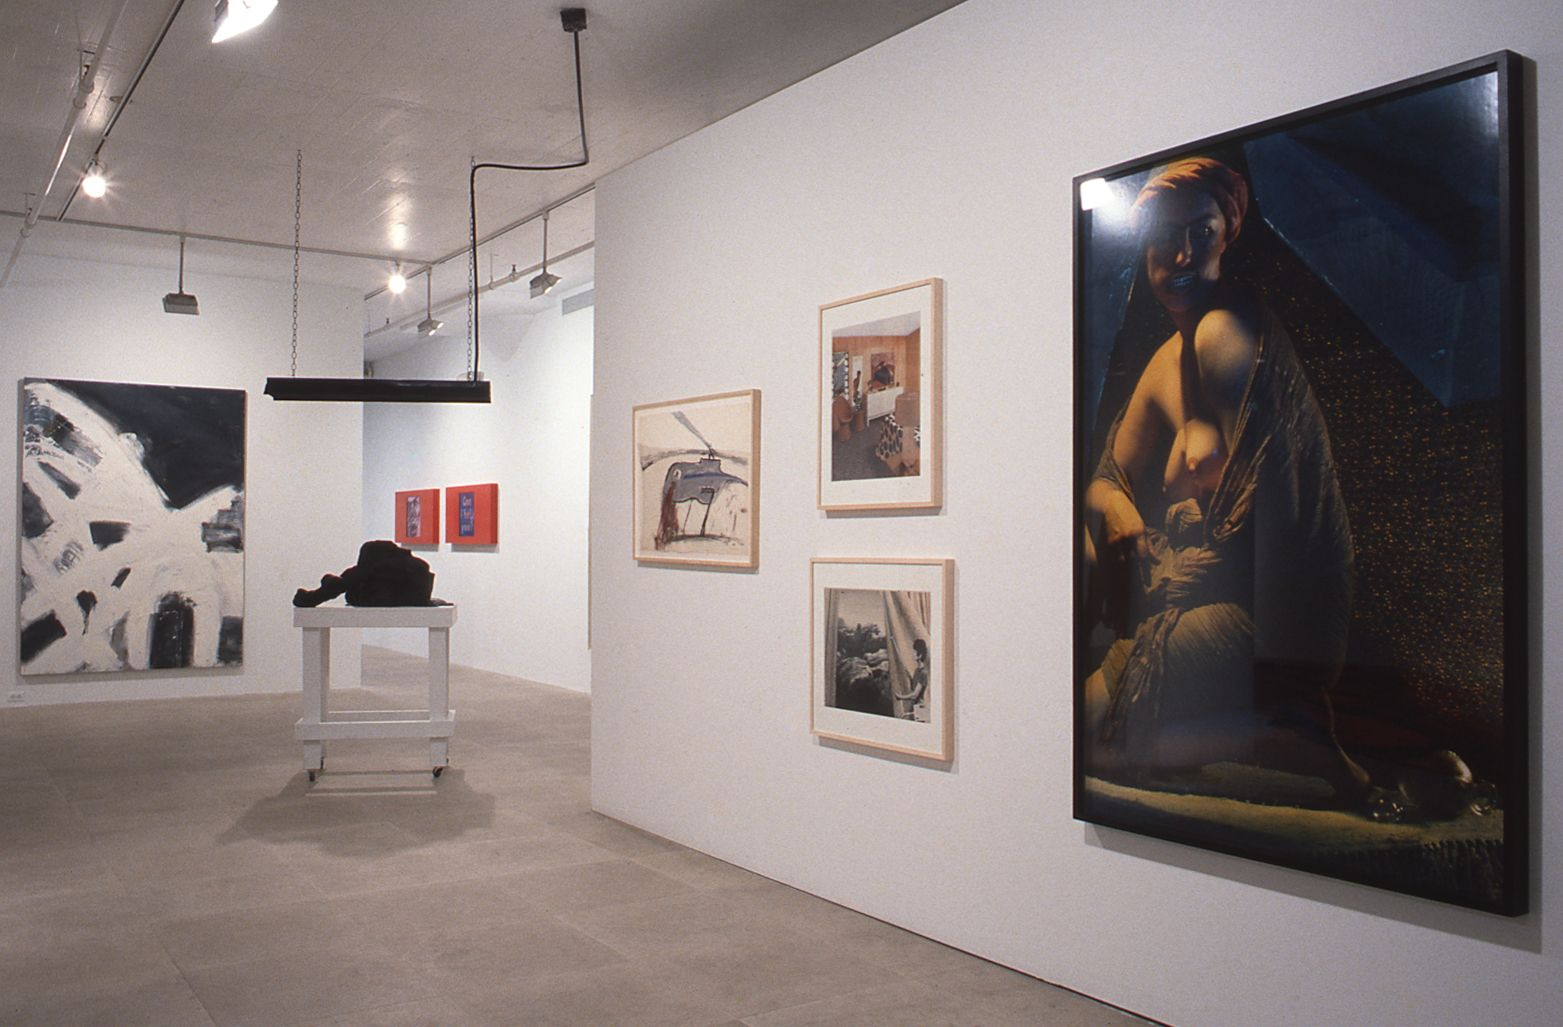 Installation view, Women's Work, Greene Naftali, New York, 1996